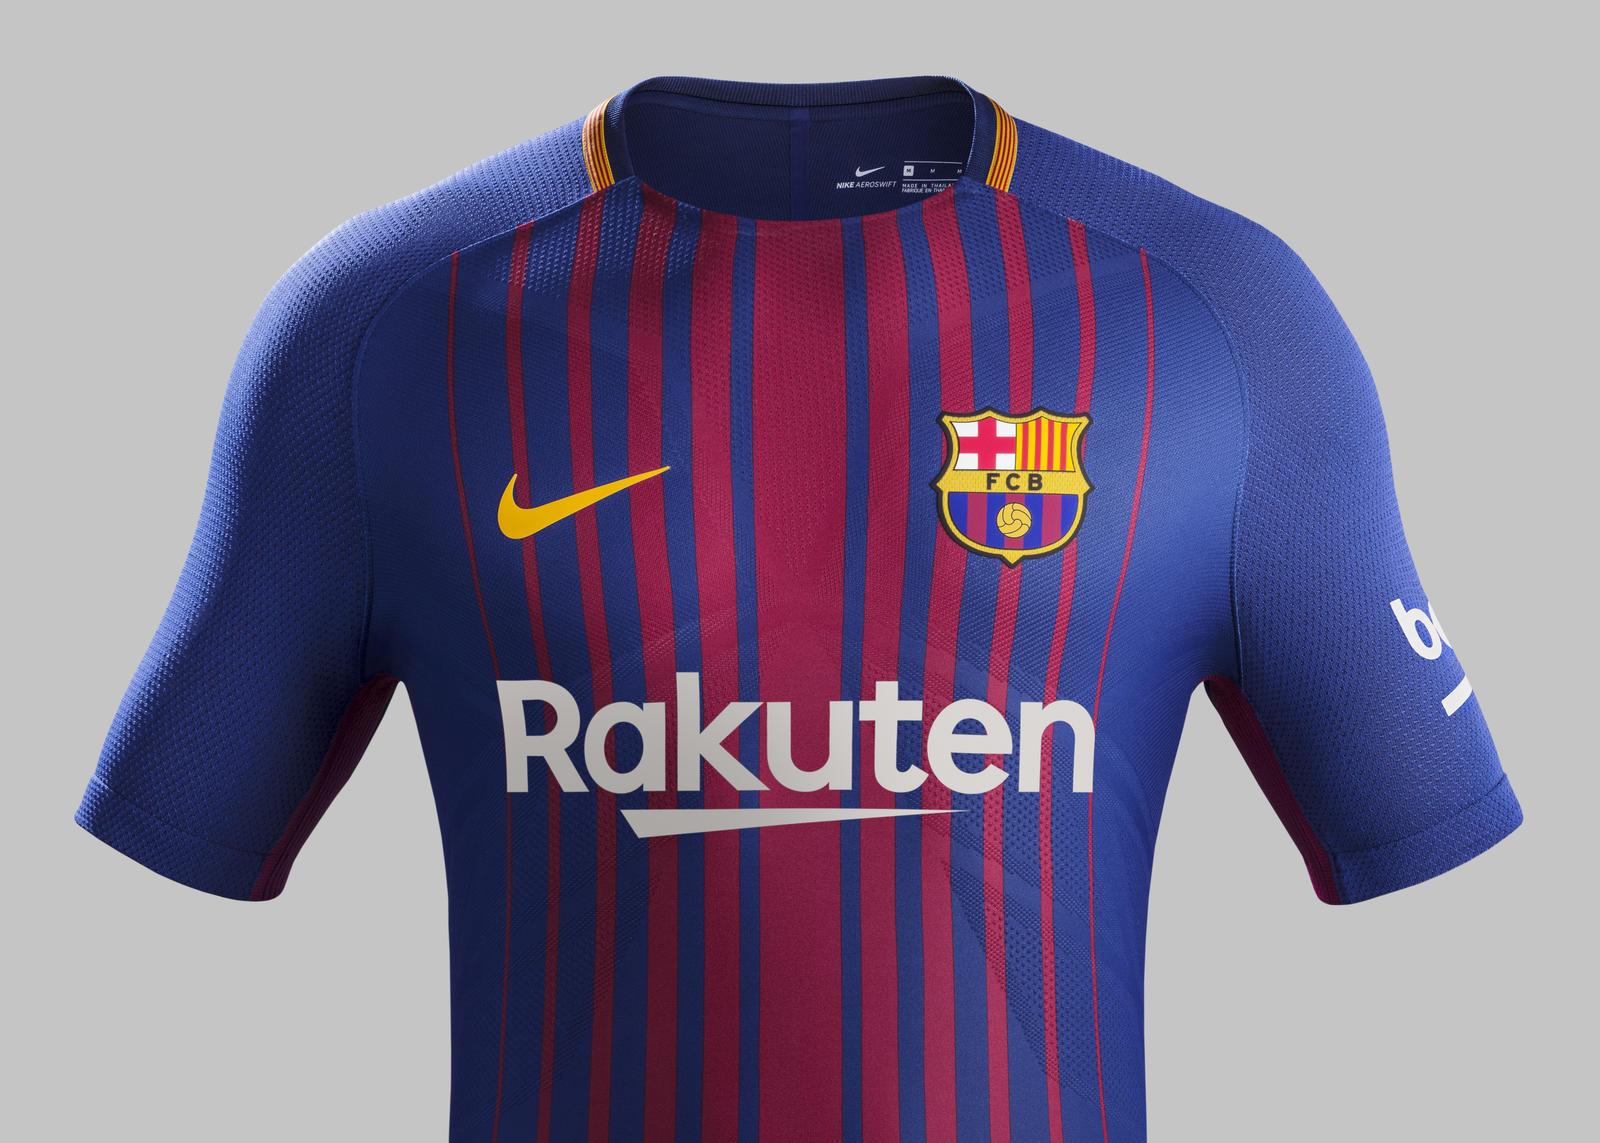 sale retailer 6541e 32896 Barcelona 17/18 Nike Home Kit   17/18 Kits   Football shirt blog